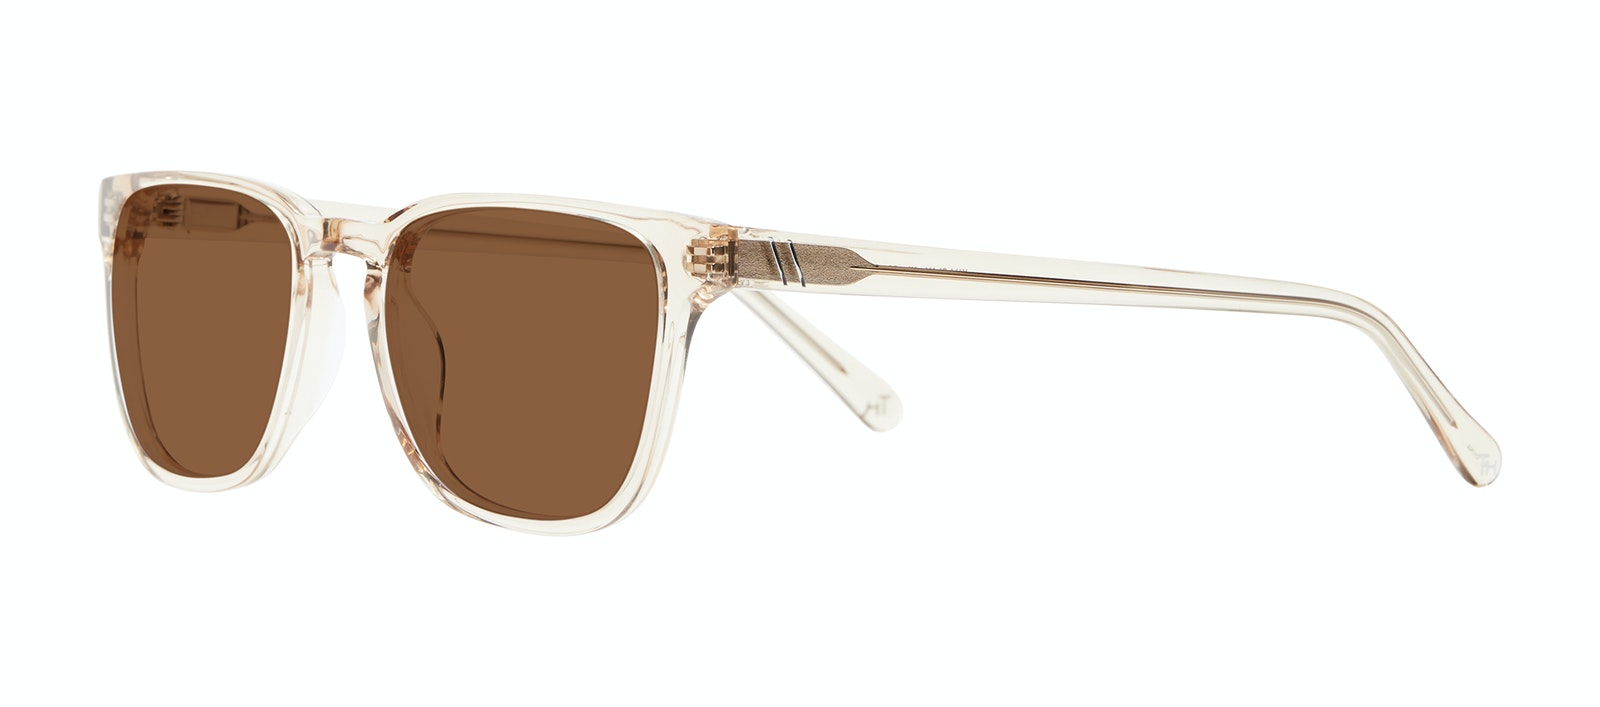 Affordable Fashion Glasses Square Sunglasses Men Kim Clay Tilt